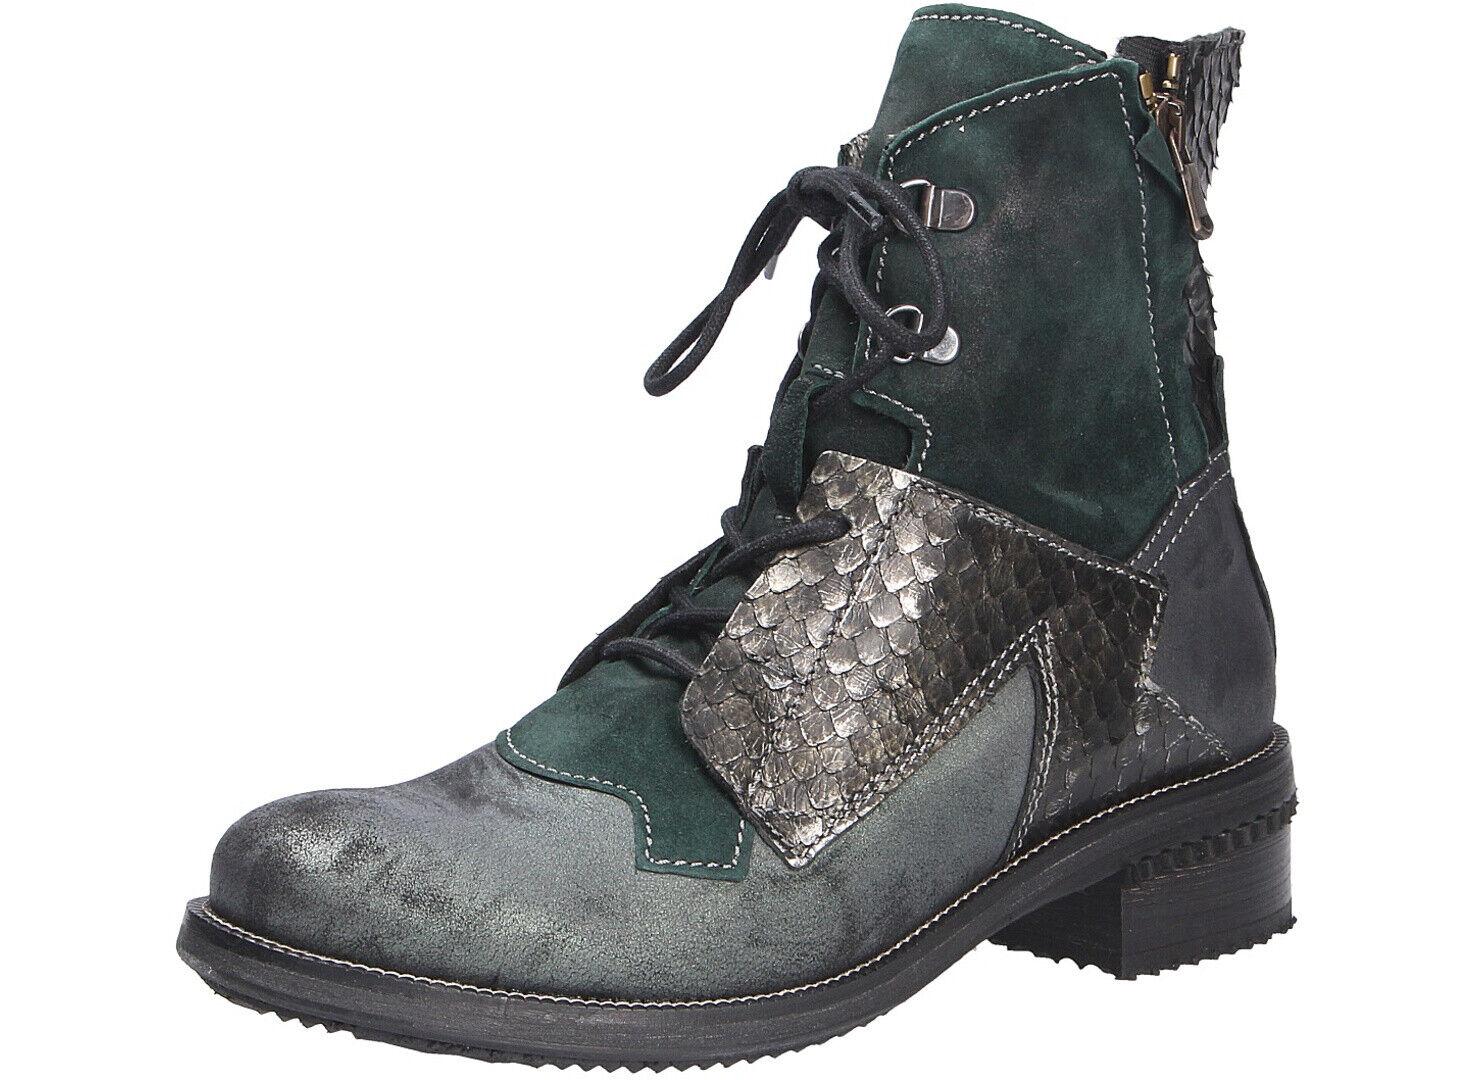 Charme Damen Fashion Stiefel Stiefel 803L-combA Grün NEU